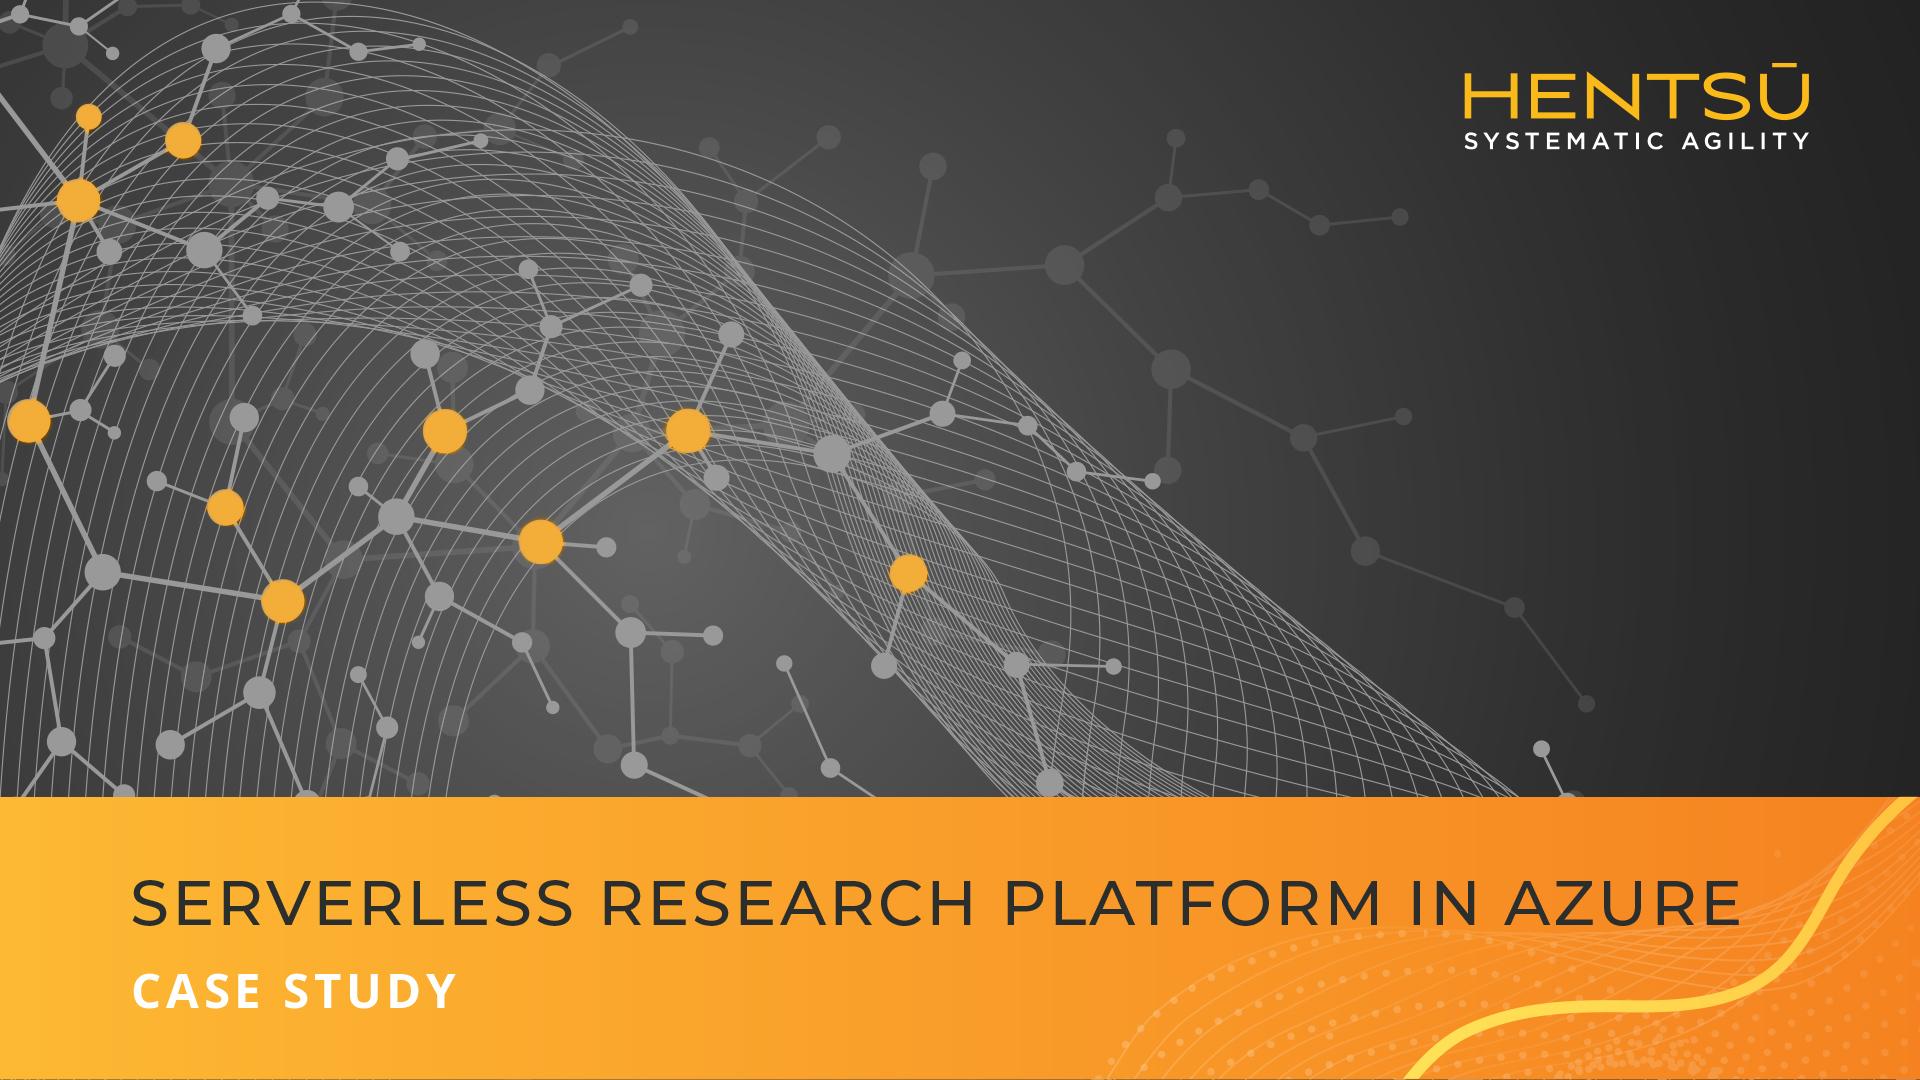 Case-Study-Serverless-Research-Platform-in-Azure